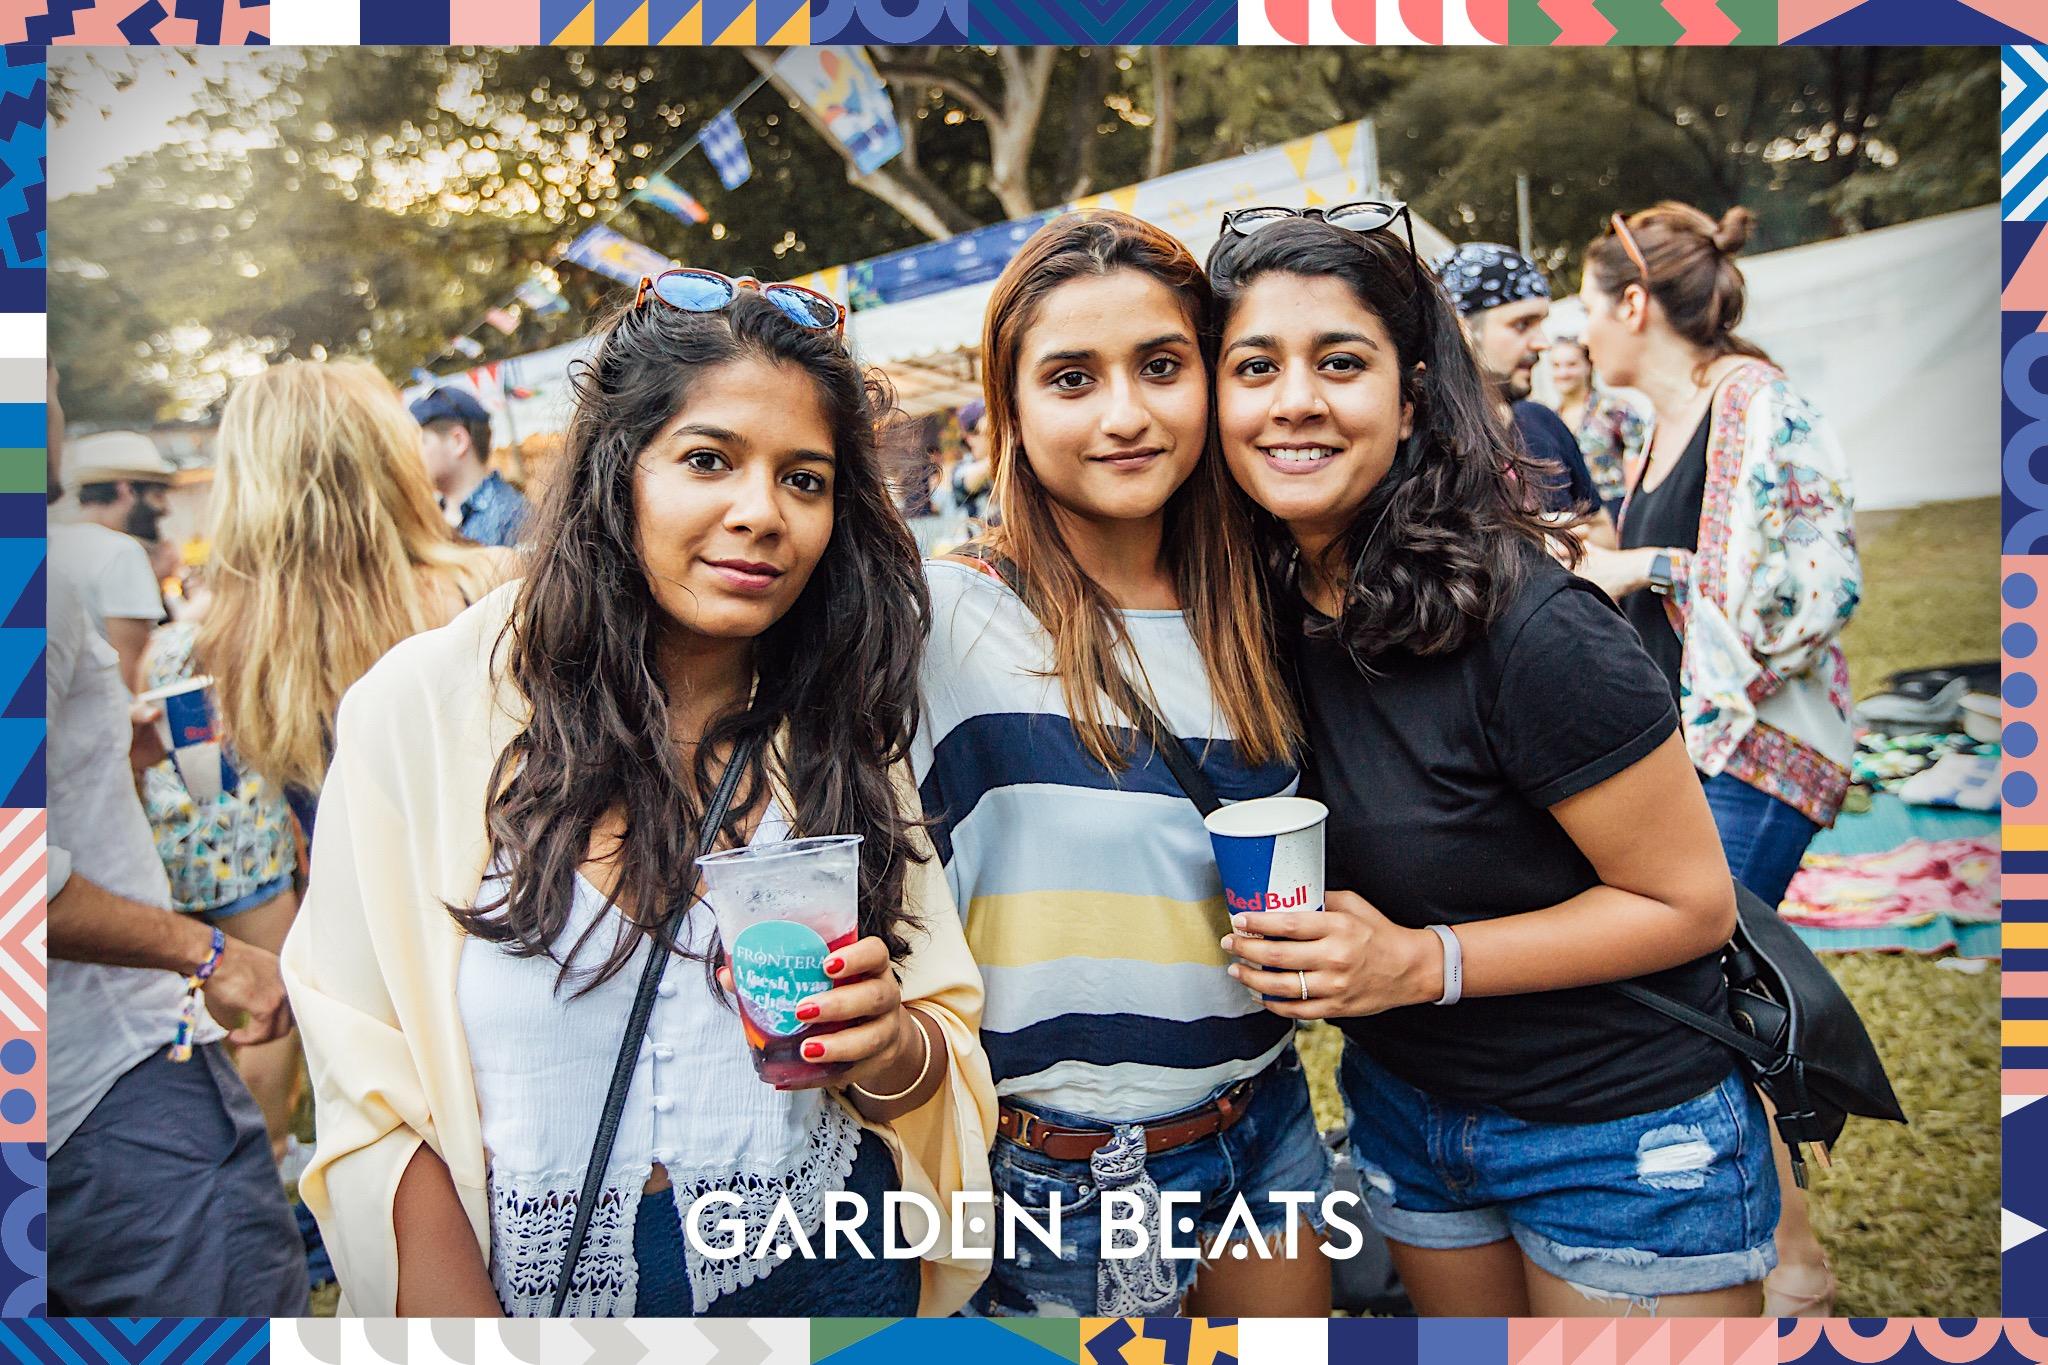 18032017_GardenBeats_Colossal674_WatermarkedGB.jpg